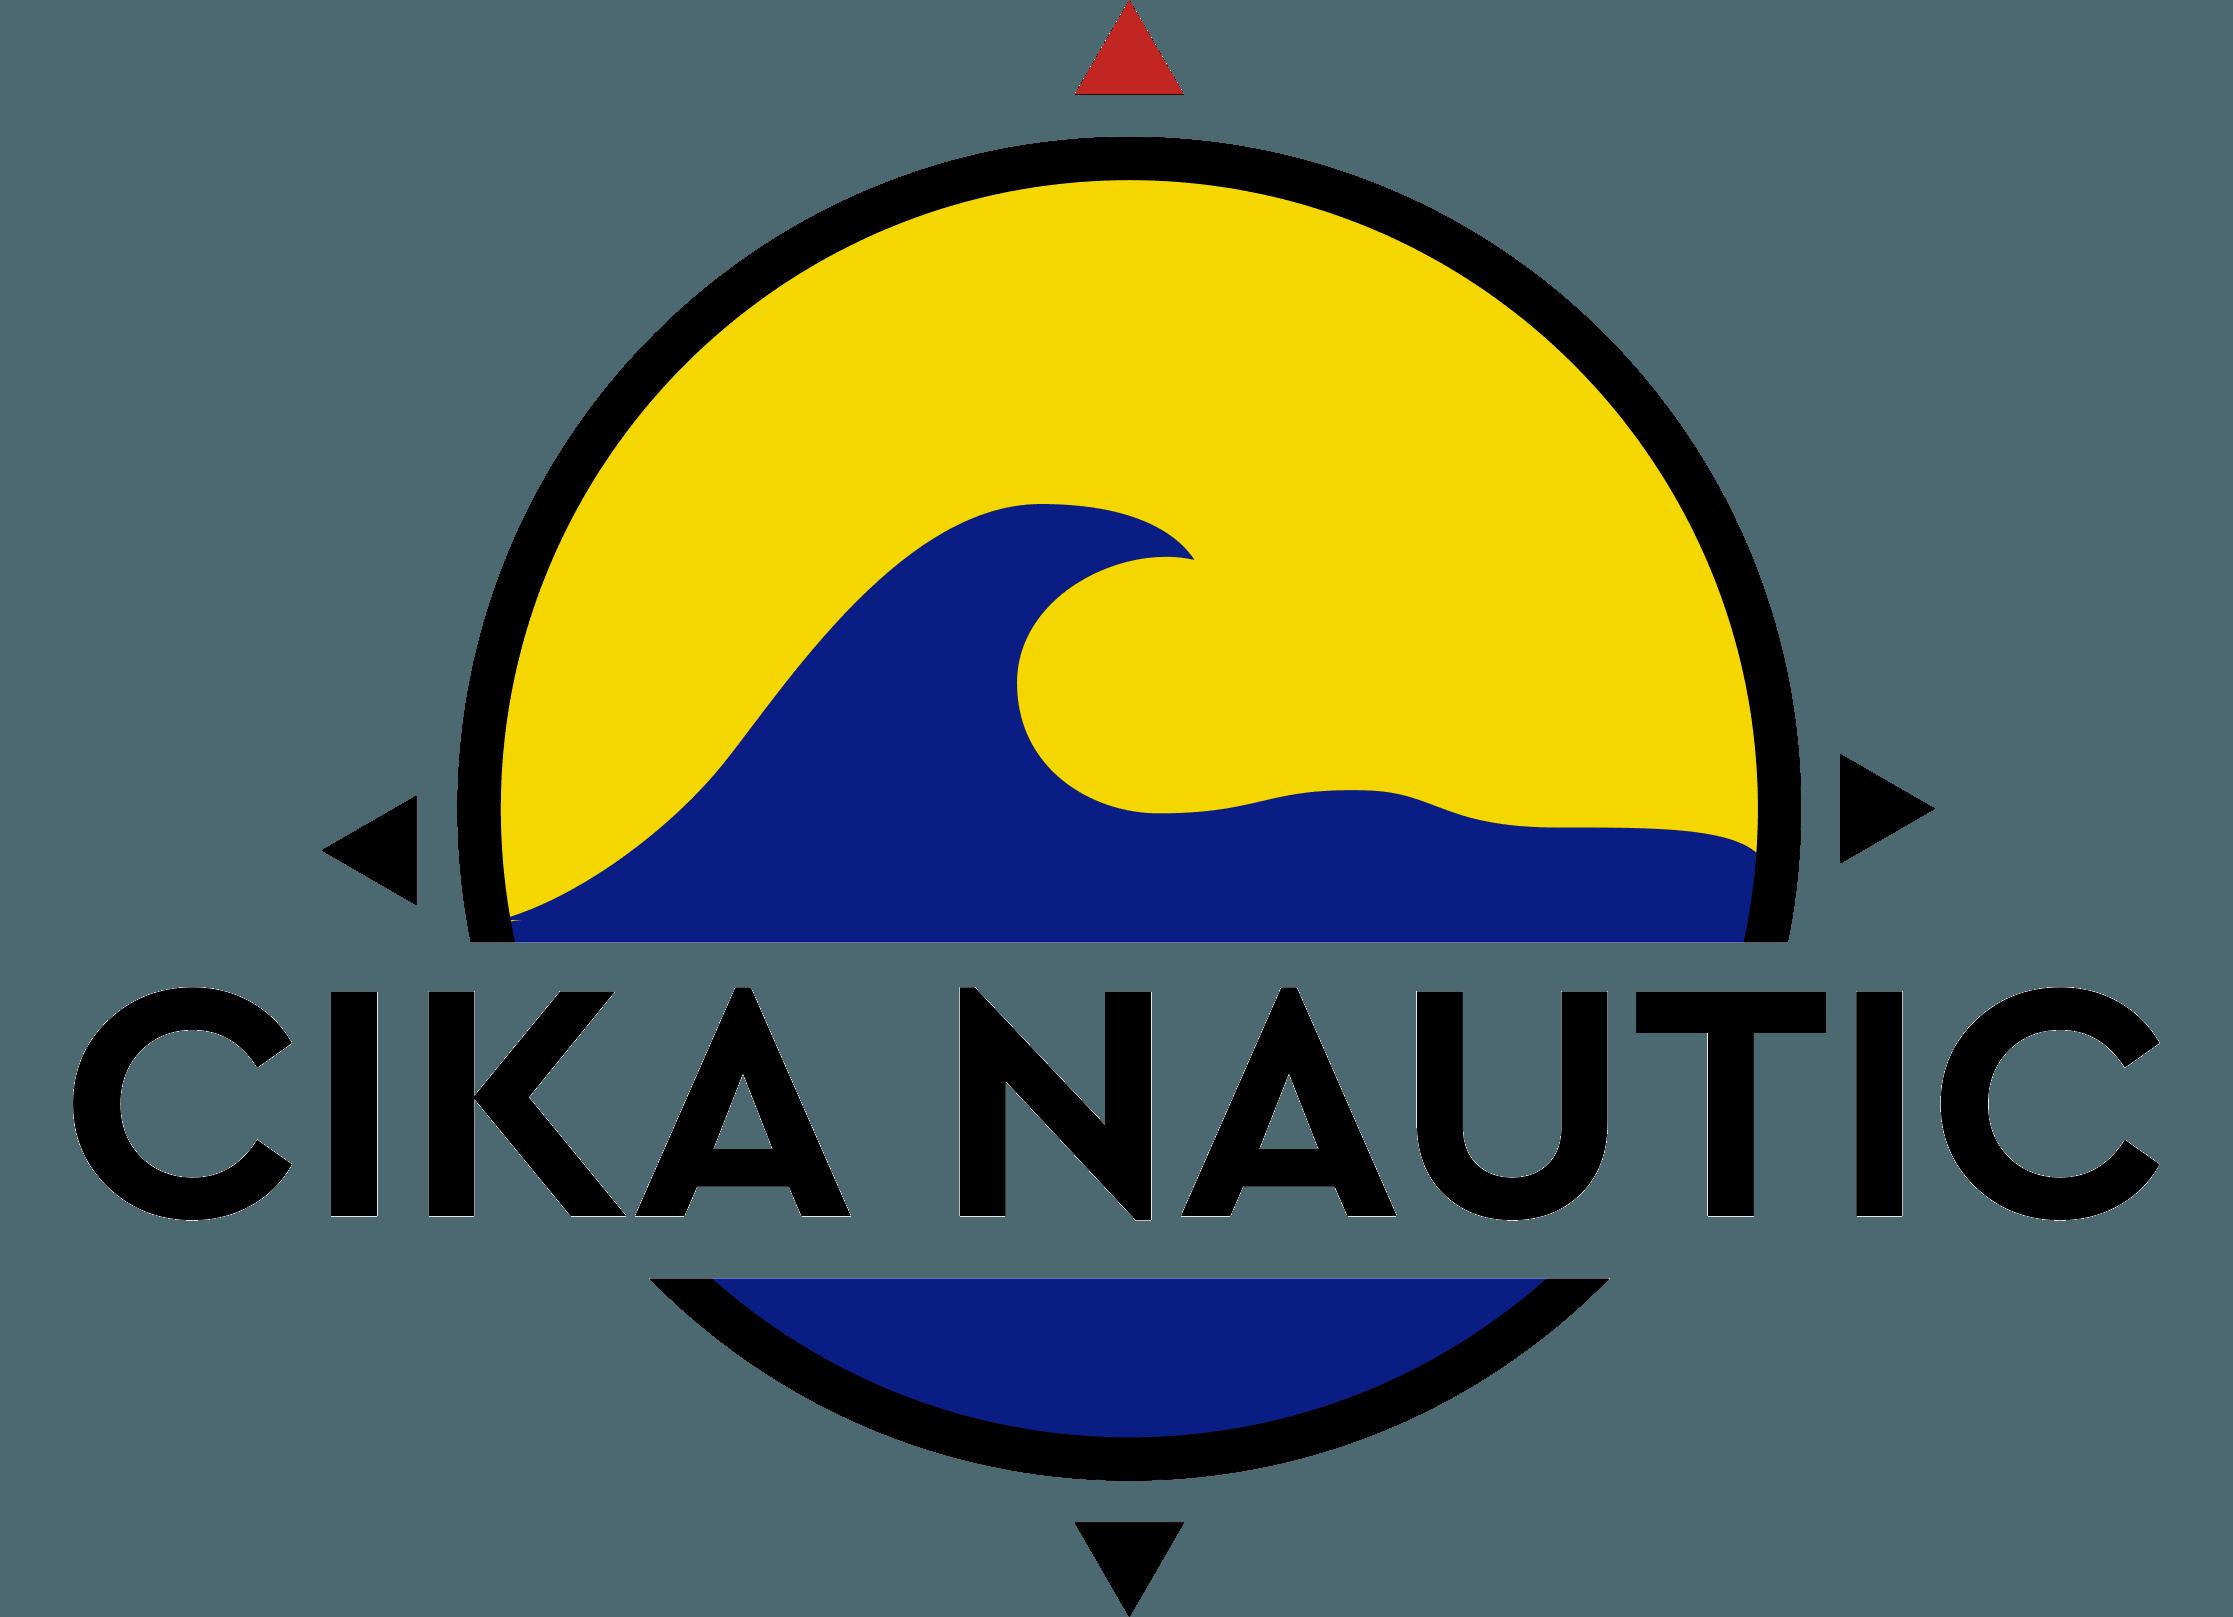 Cika Nautic